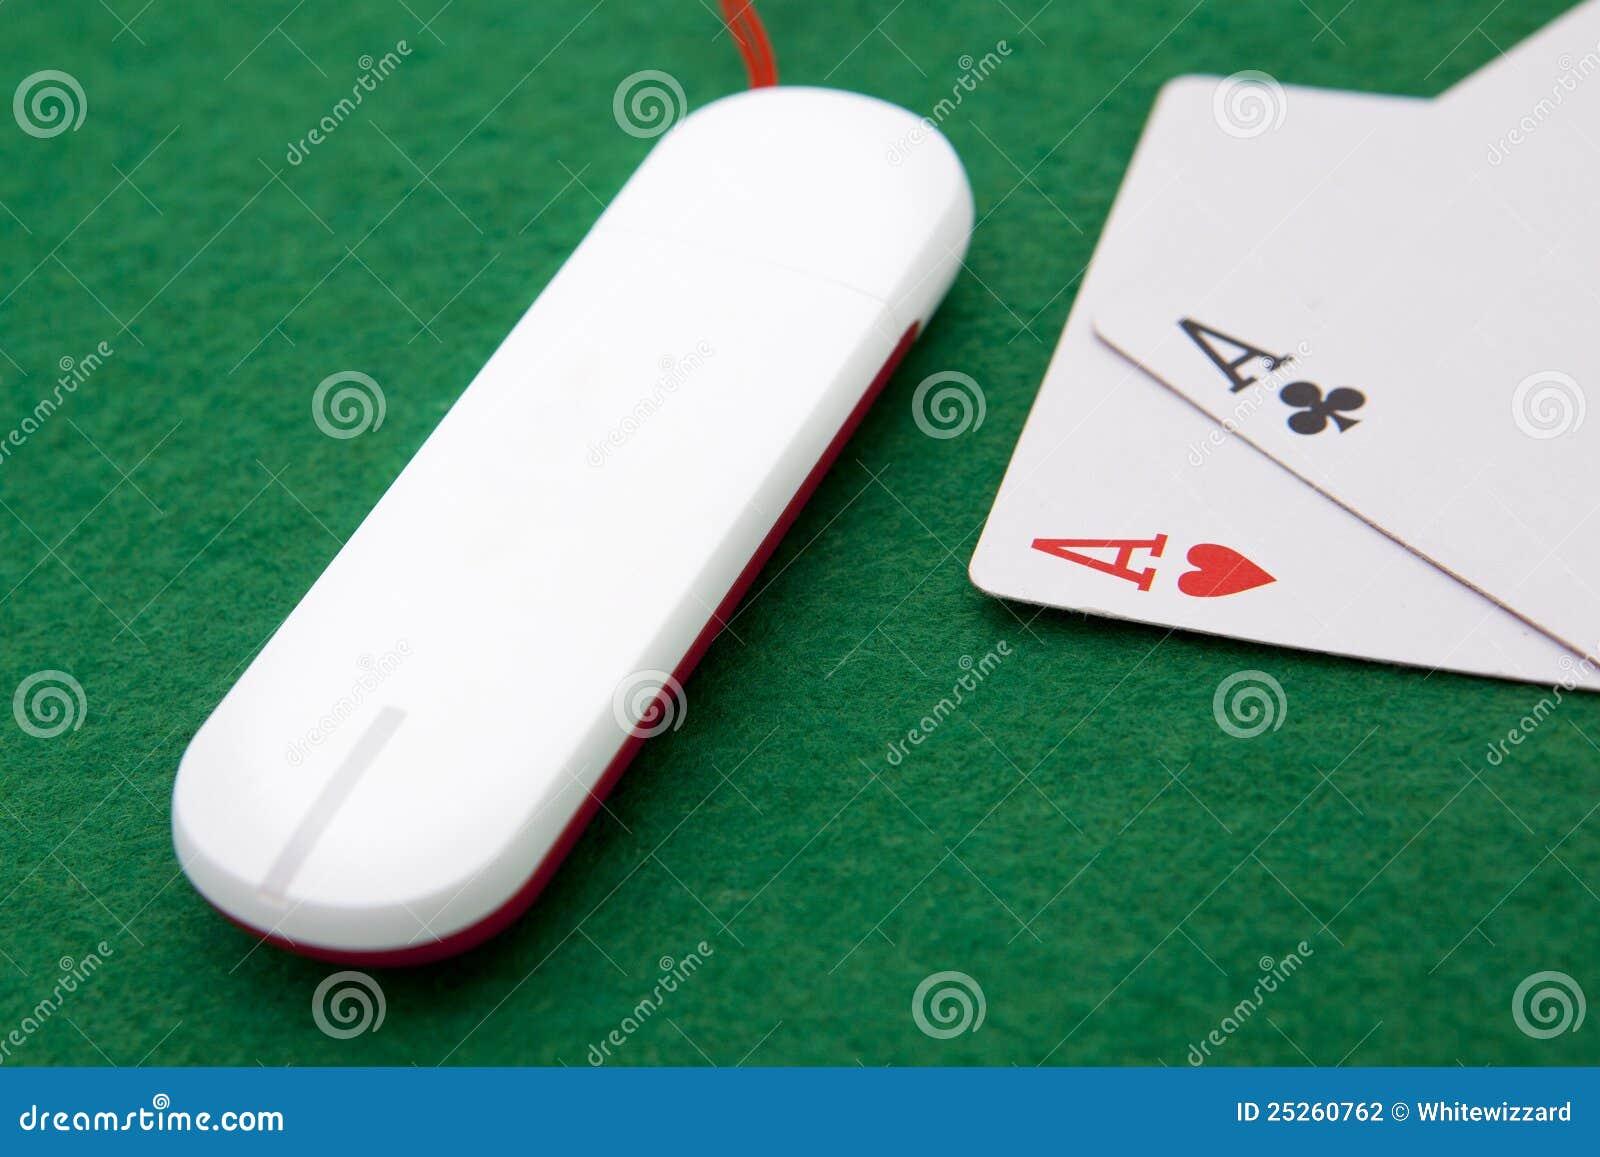 Bellagio roulette limits